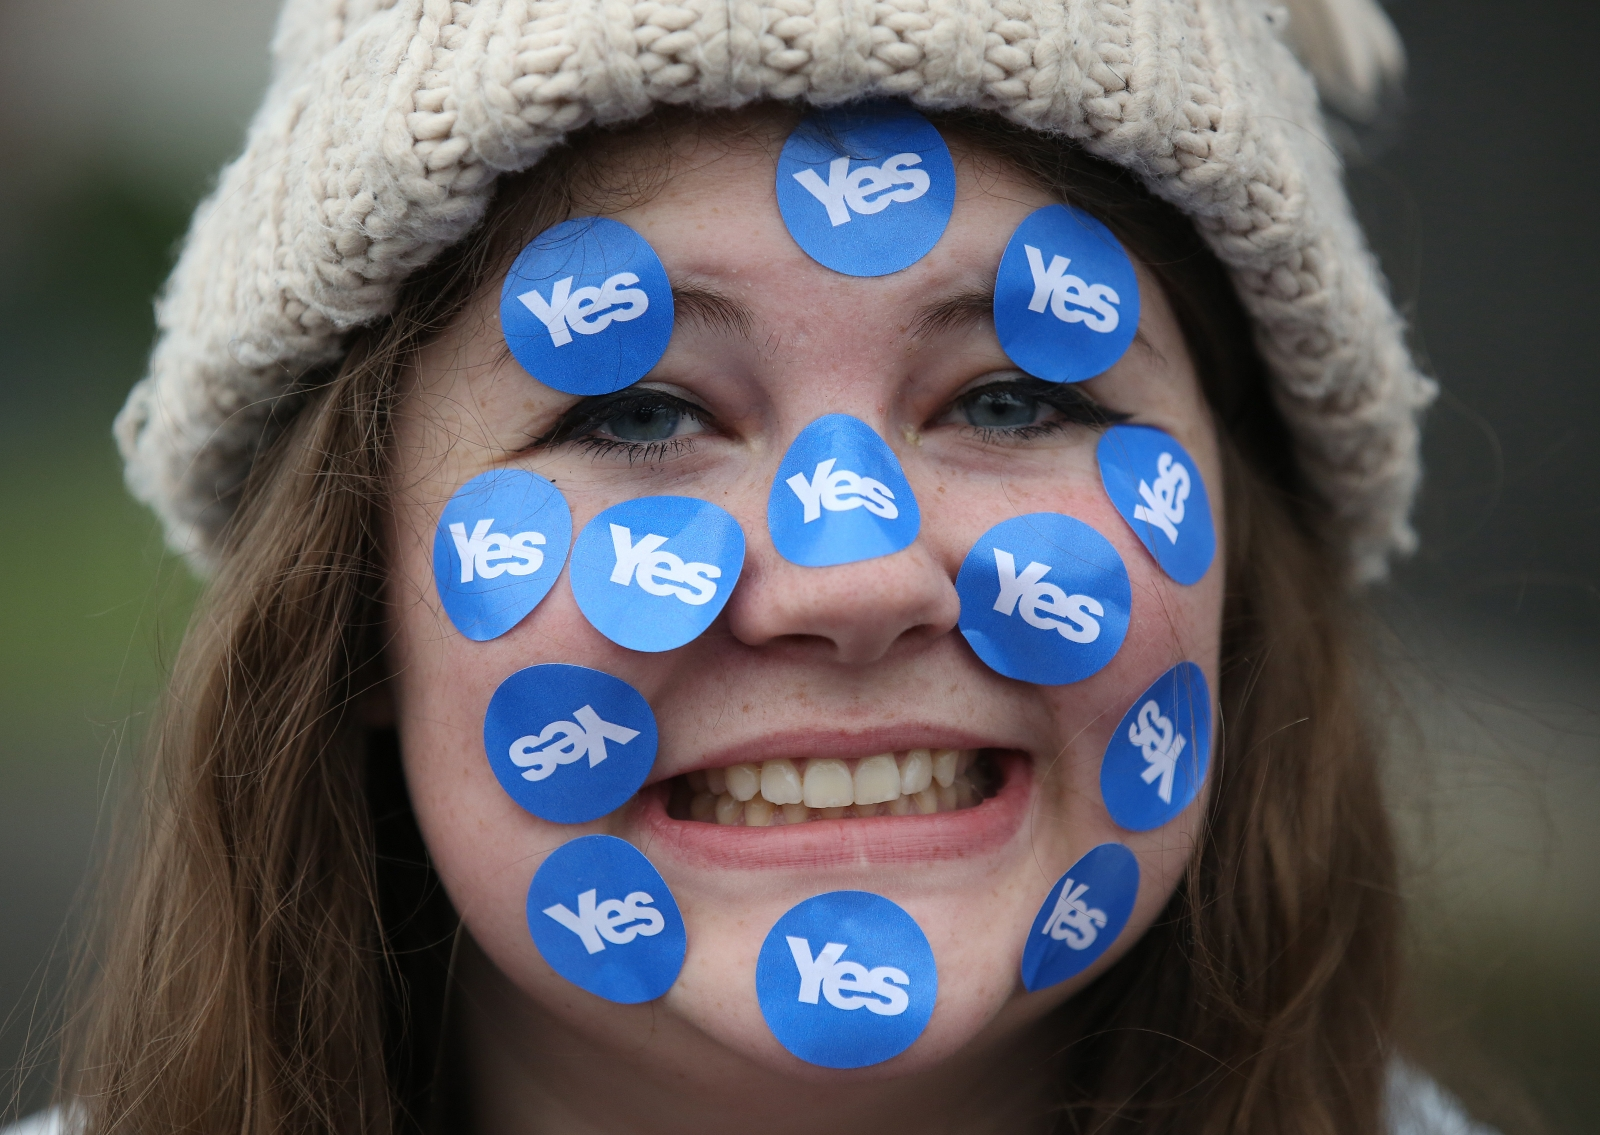 Scottish Independence: The Politics of Cloudy Optimism vs Relentless Negativity